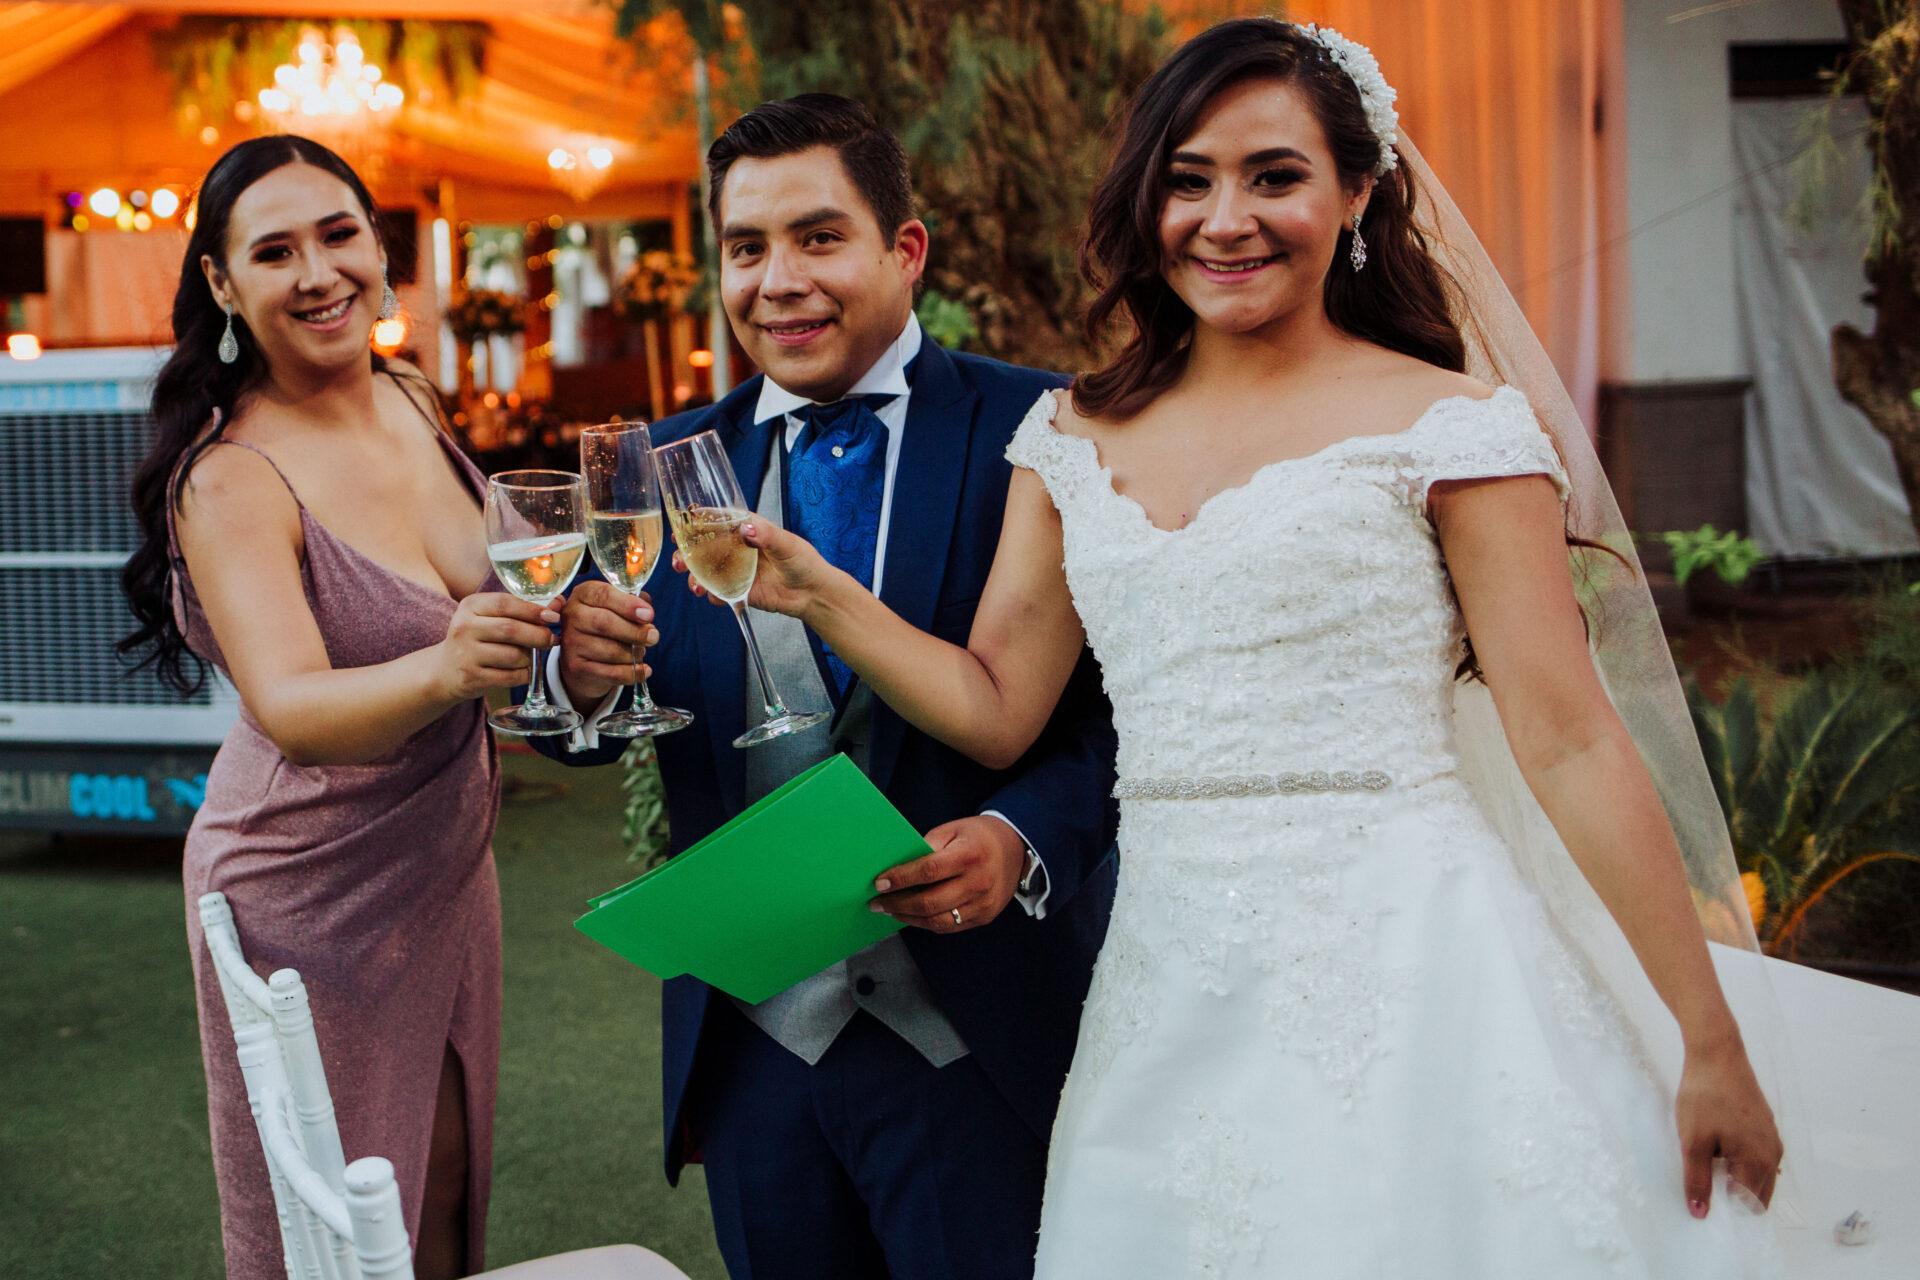 javier_noriega_fotografo_bodas_torreon_coahuila_zacatecas_wedding_photographer40a